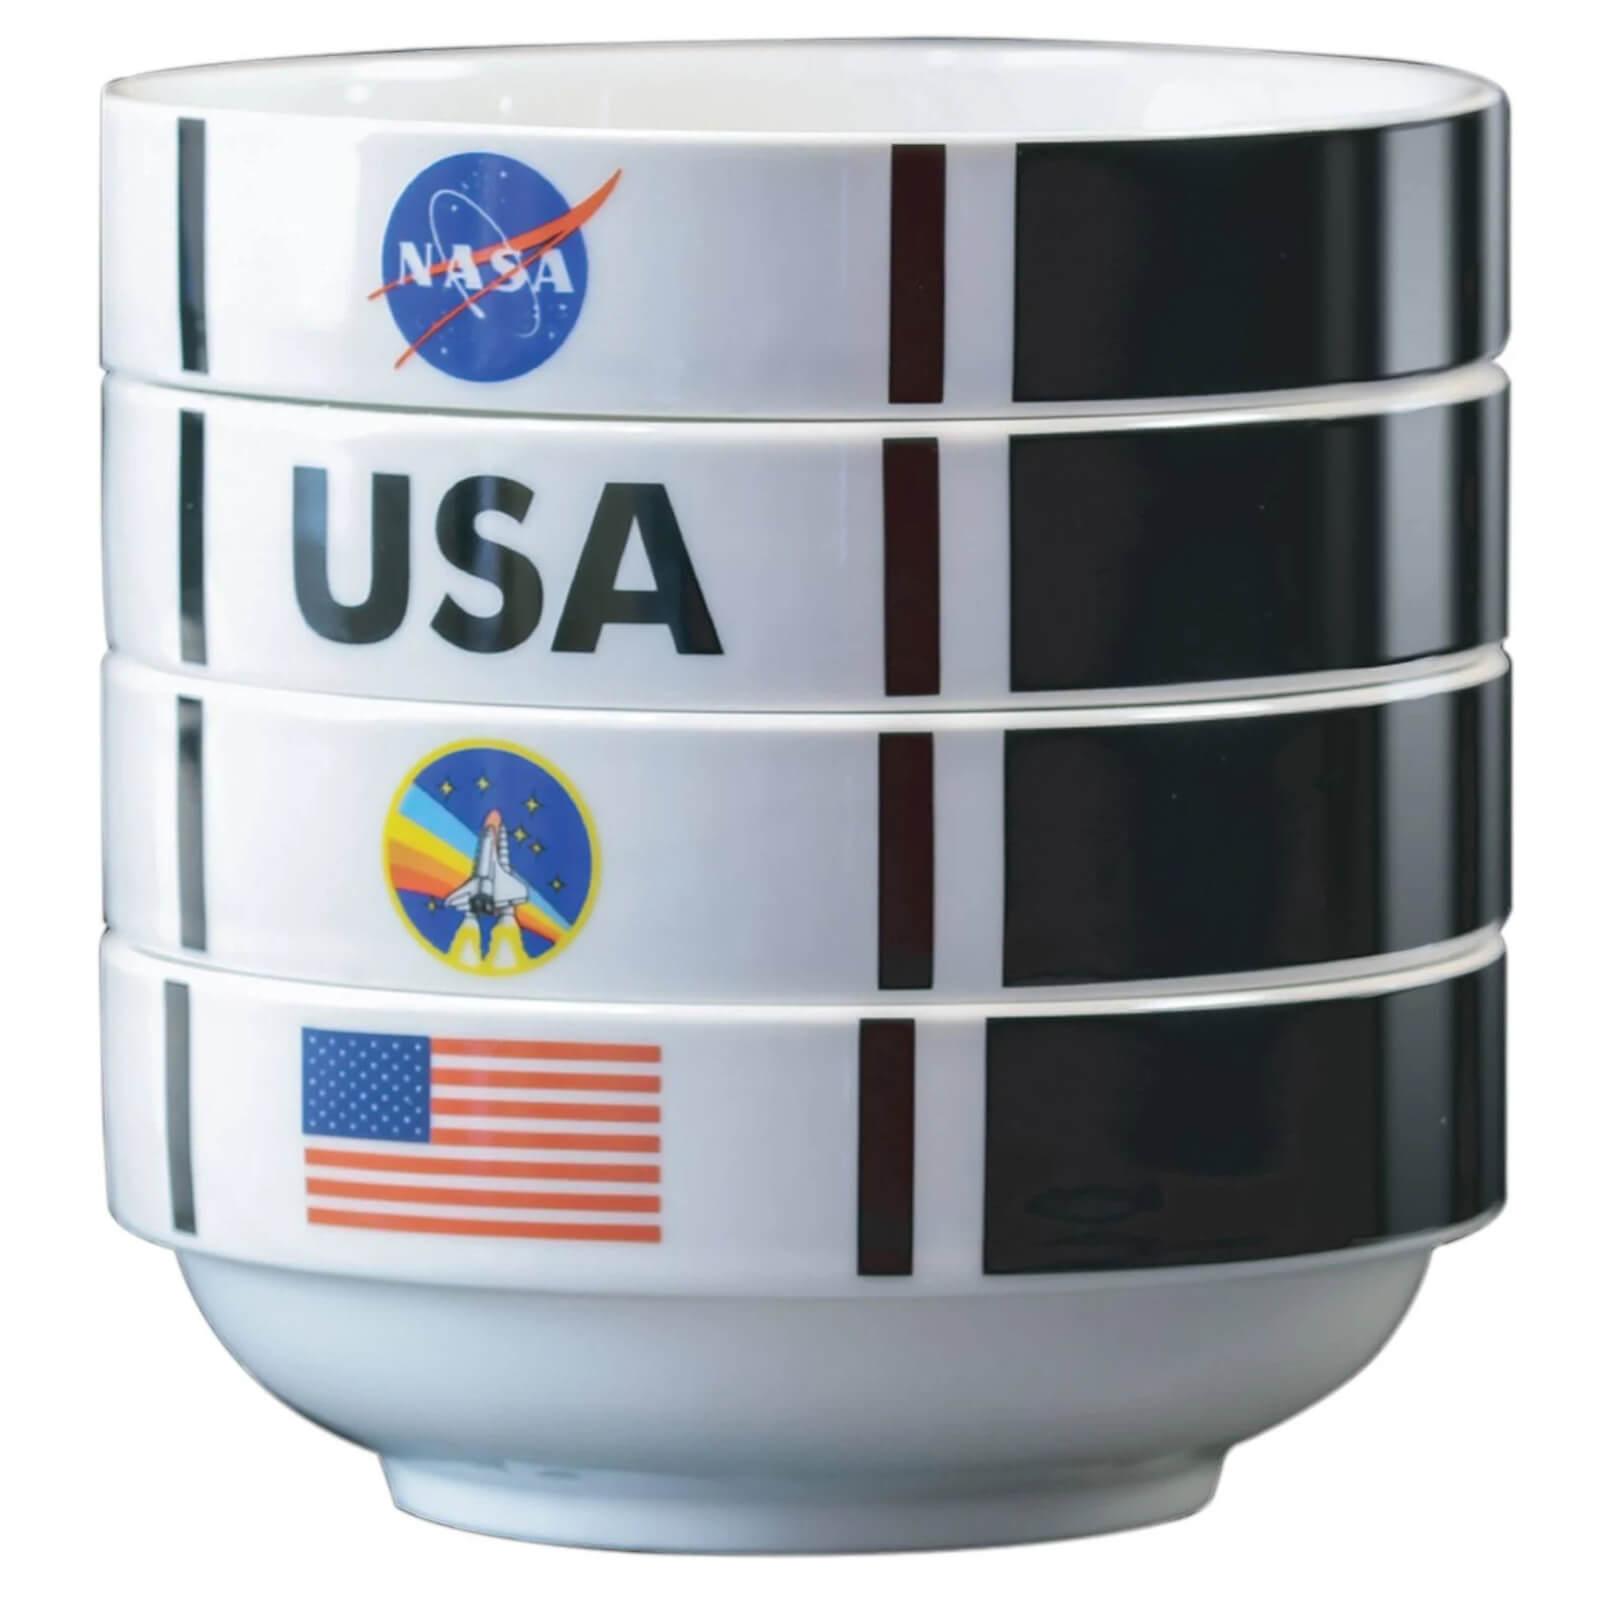 The Coop NASA Shuttle Stackable Bowl Set